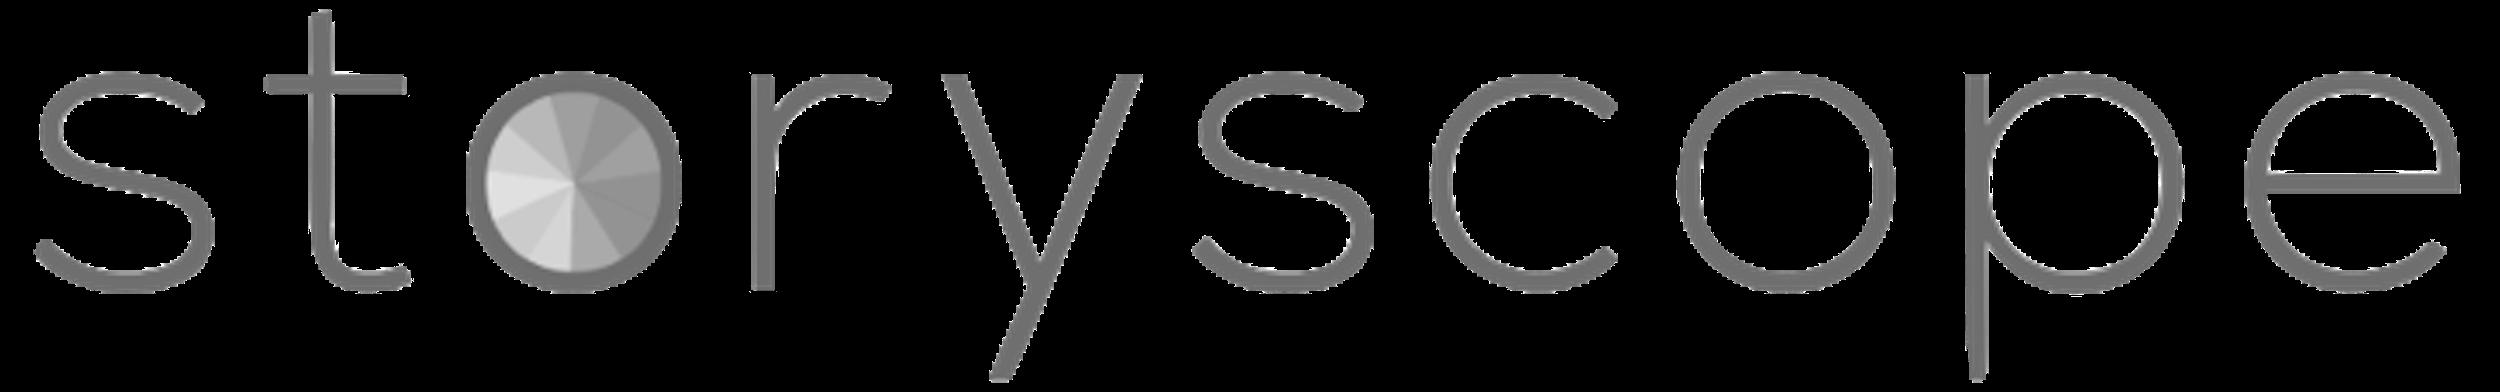 storyscope logo copy.png